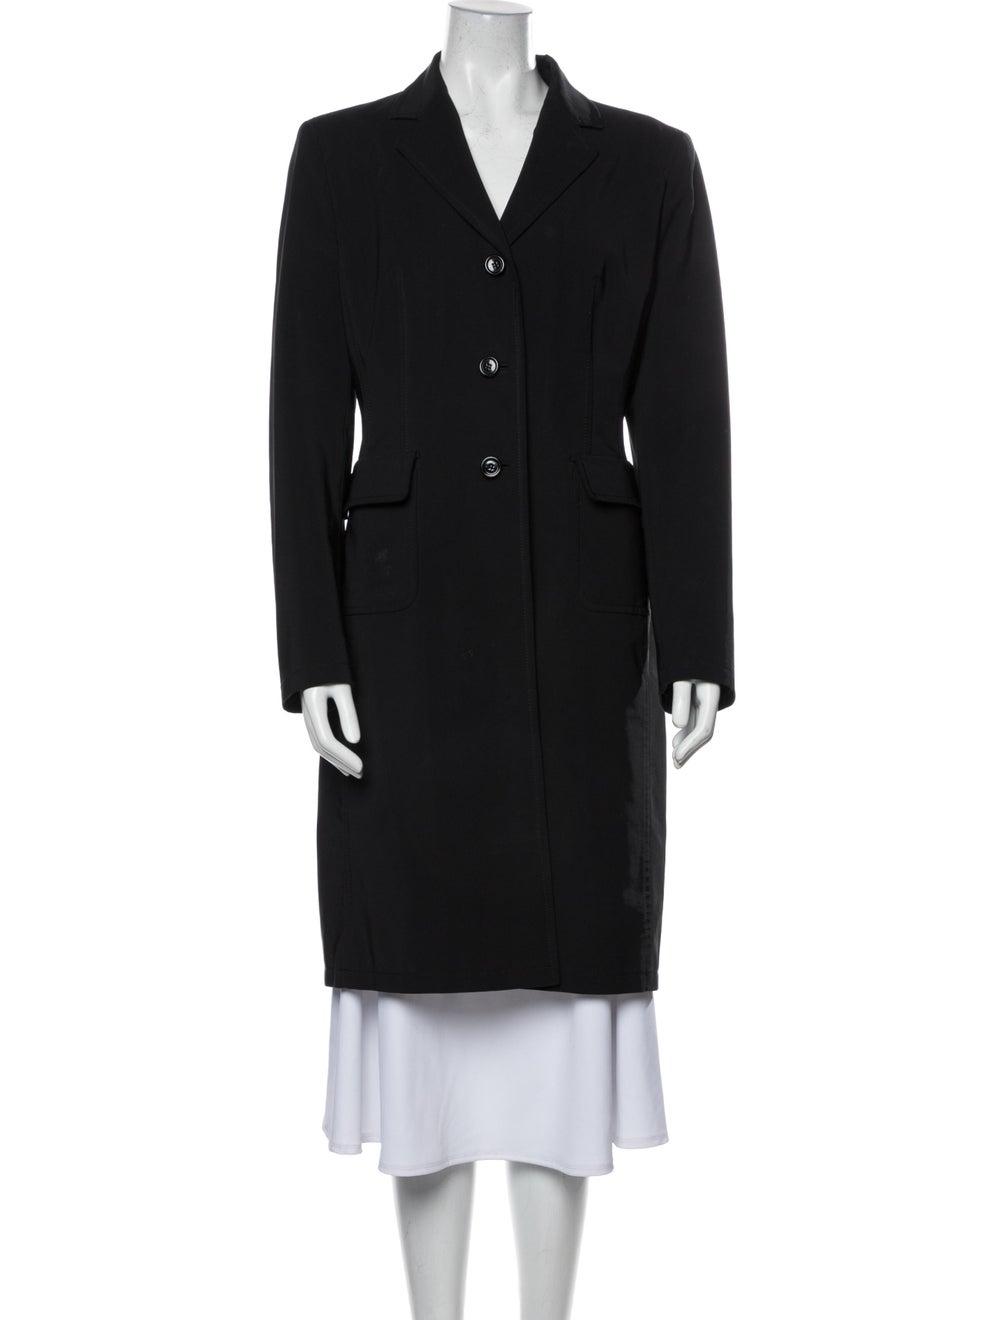 Prada Vintage 1990's Coat Black - image 1